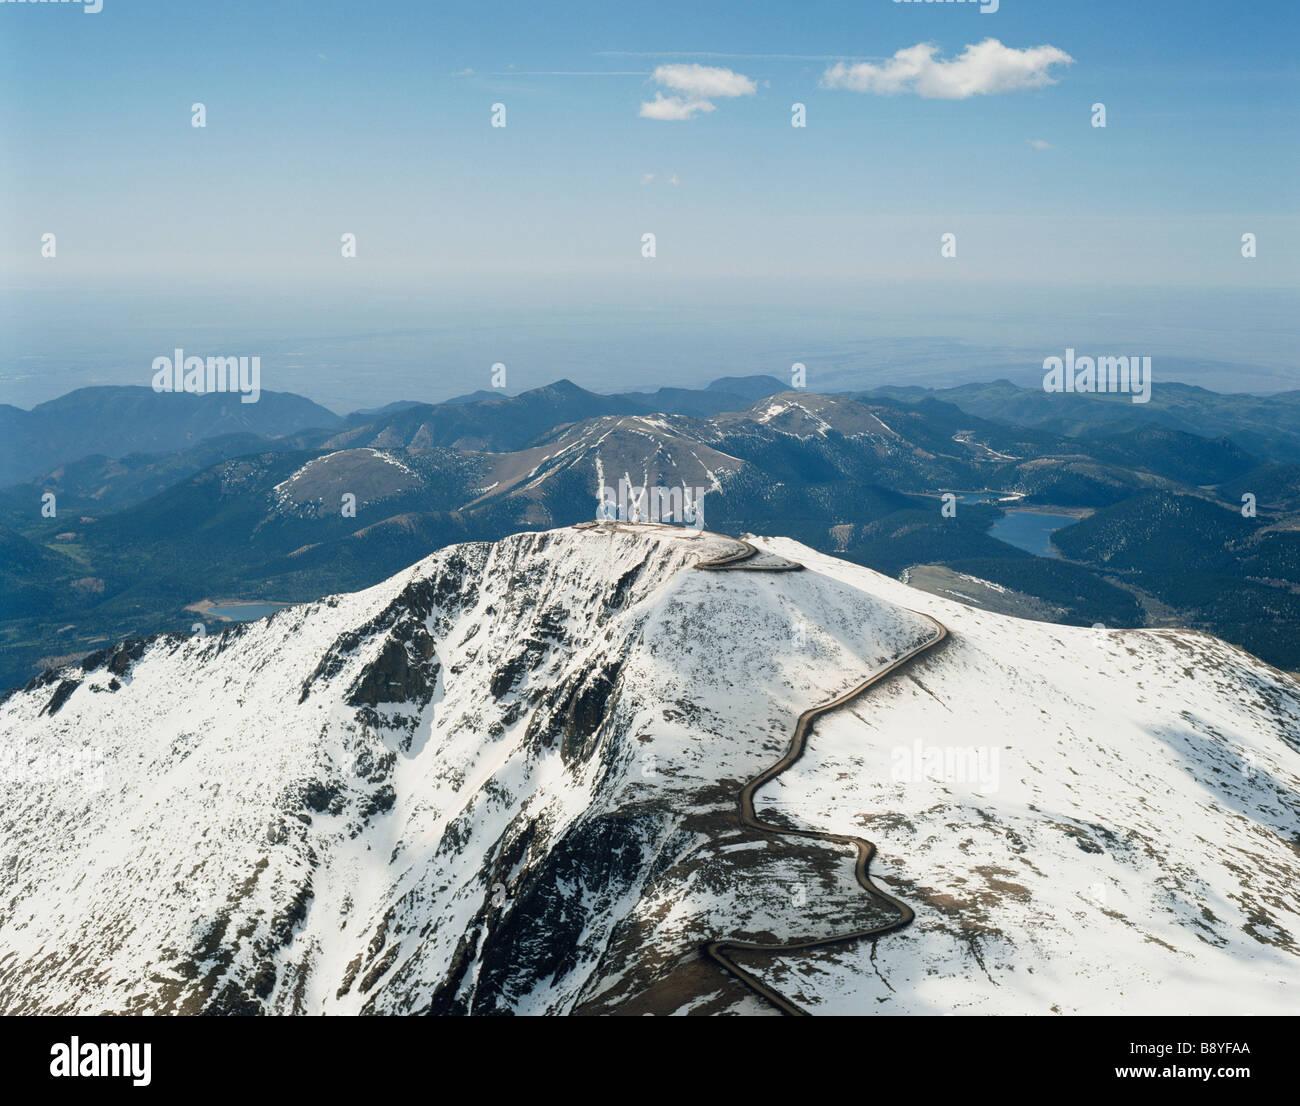 Pikes Peak In Colorado Springs: USA COLORADO PIKES PEAK HIGHWAY ROAD AERIAL SNOW Stock